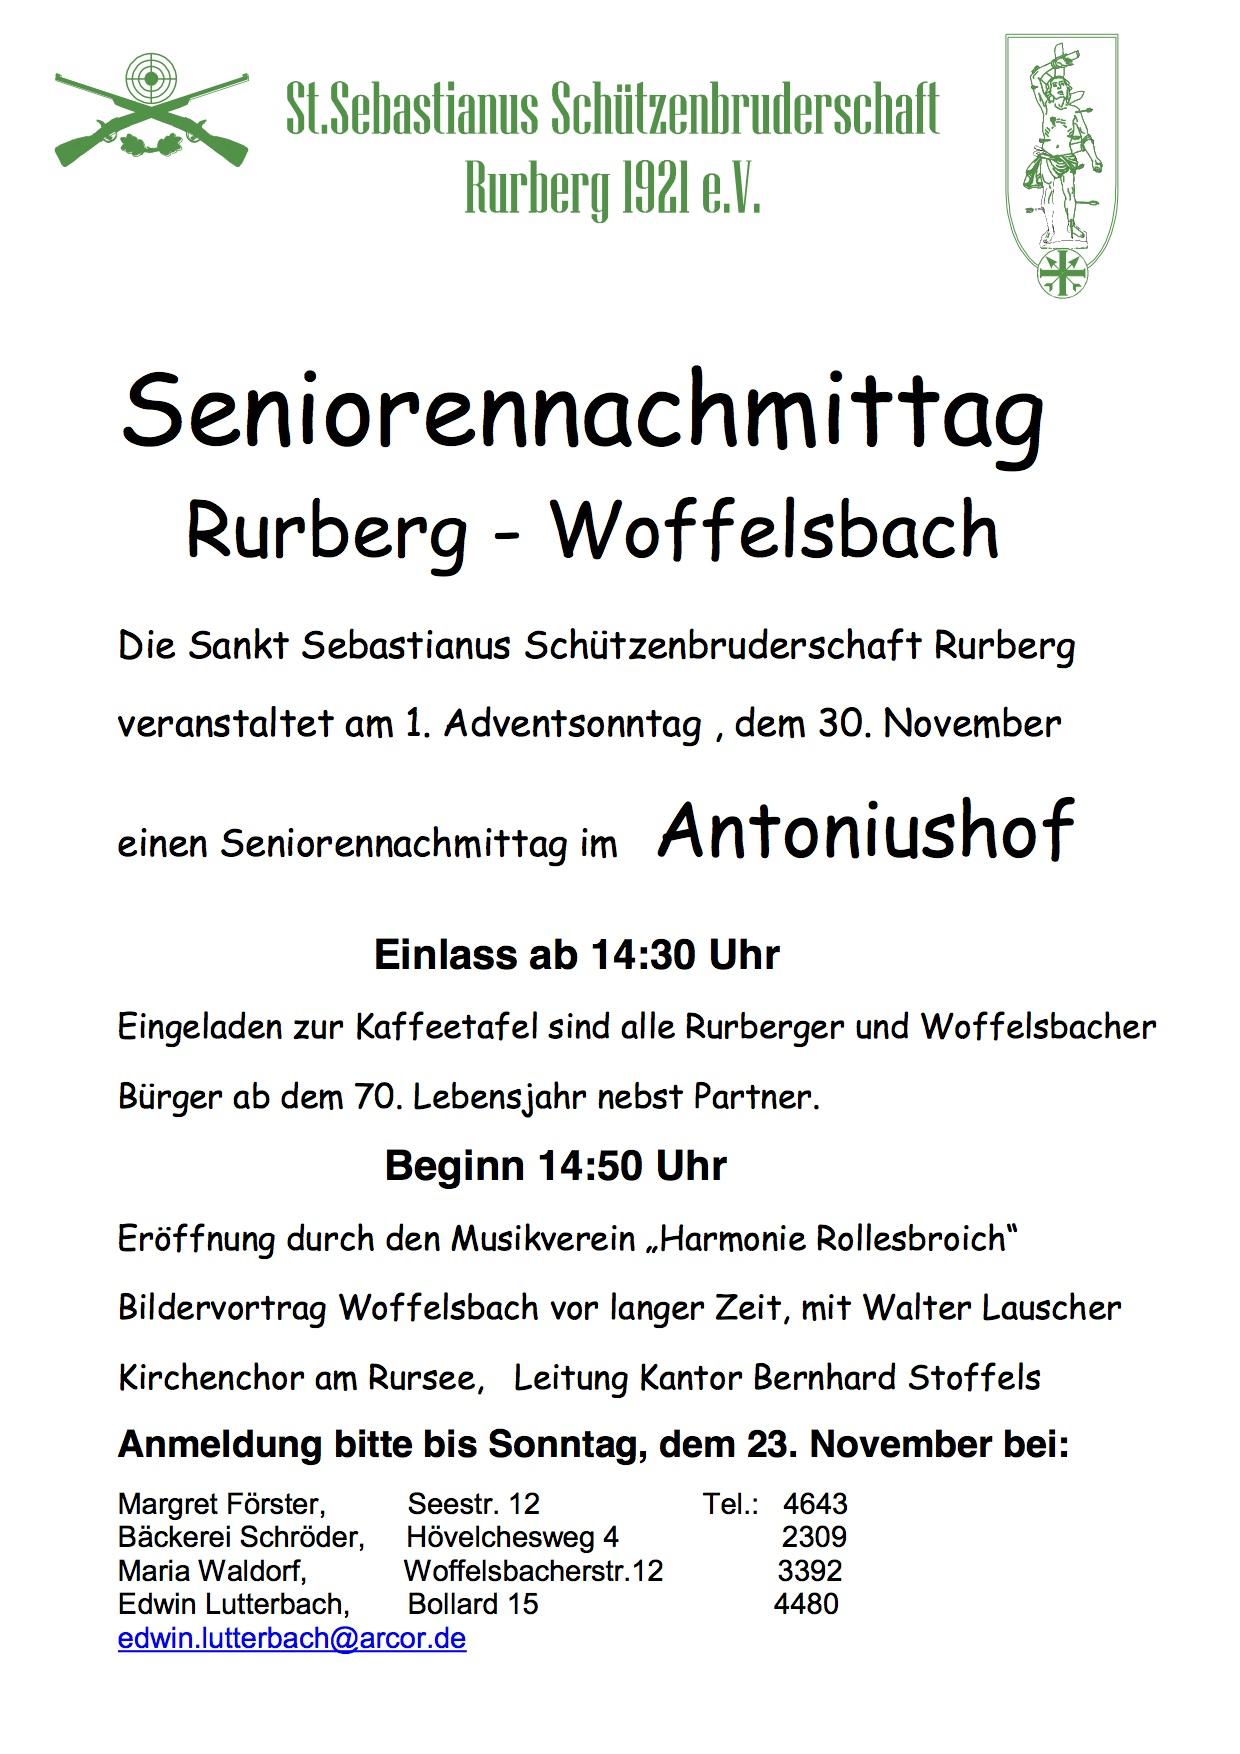 2014_10_31 Einladung Seniorennachmittag